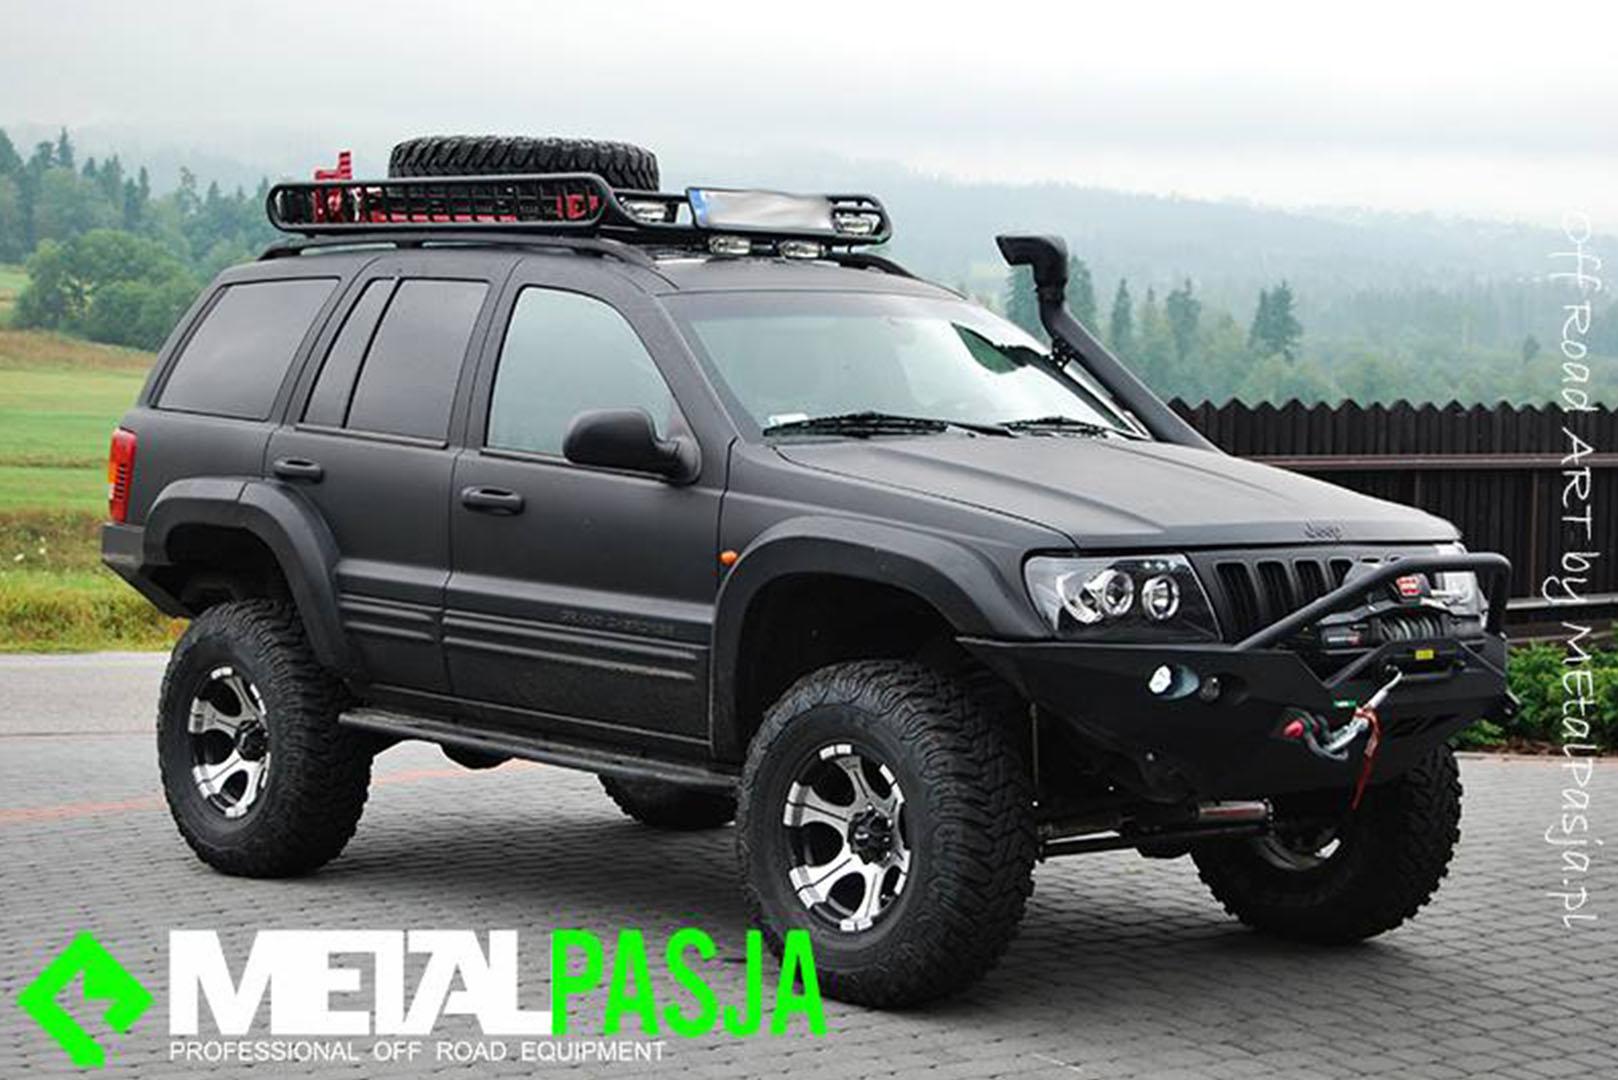 Wonderful Jeep Grand Cherokee Off Road U003eu003e Metalpasja Innowacyjne Doposażenia Offroad  | Jeep Grand Cherokee WJ